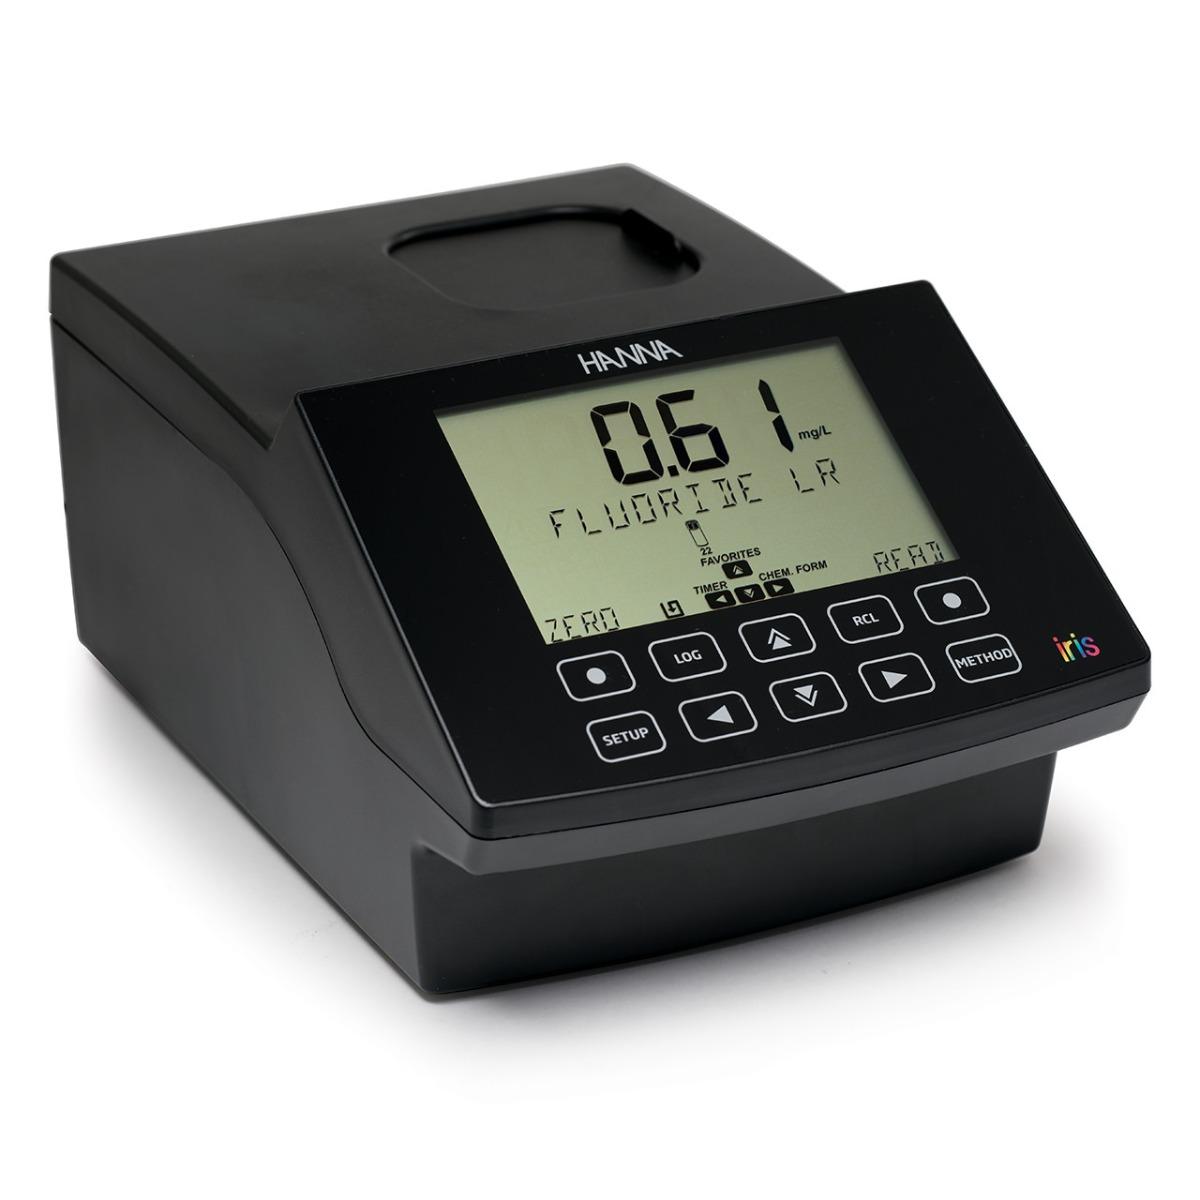 HI801 - Spettrofotometro portatile iris